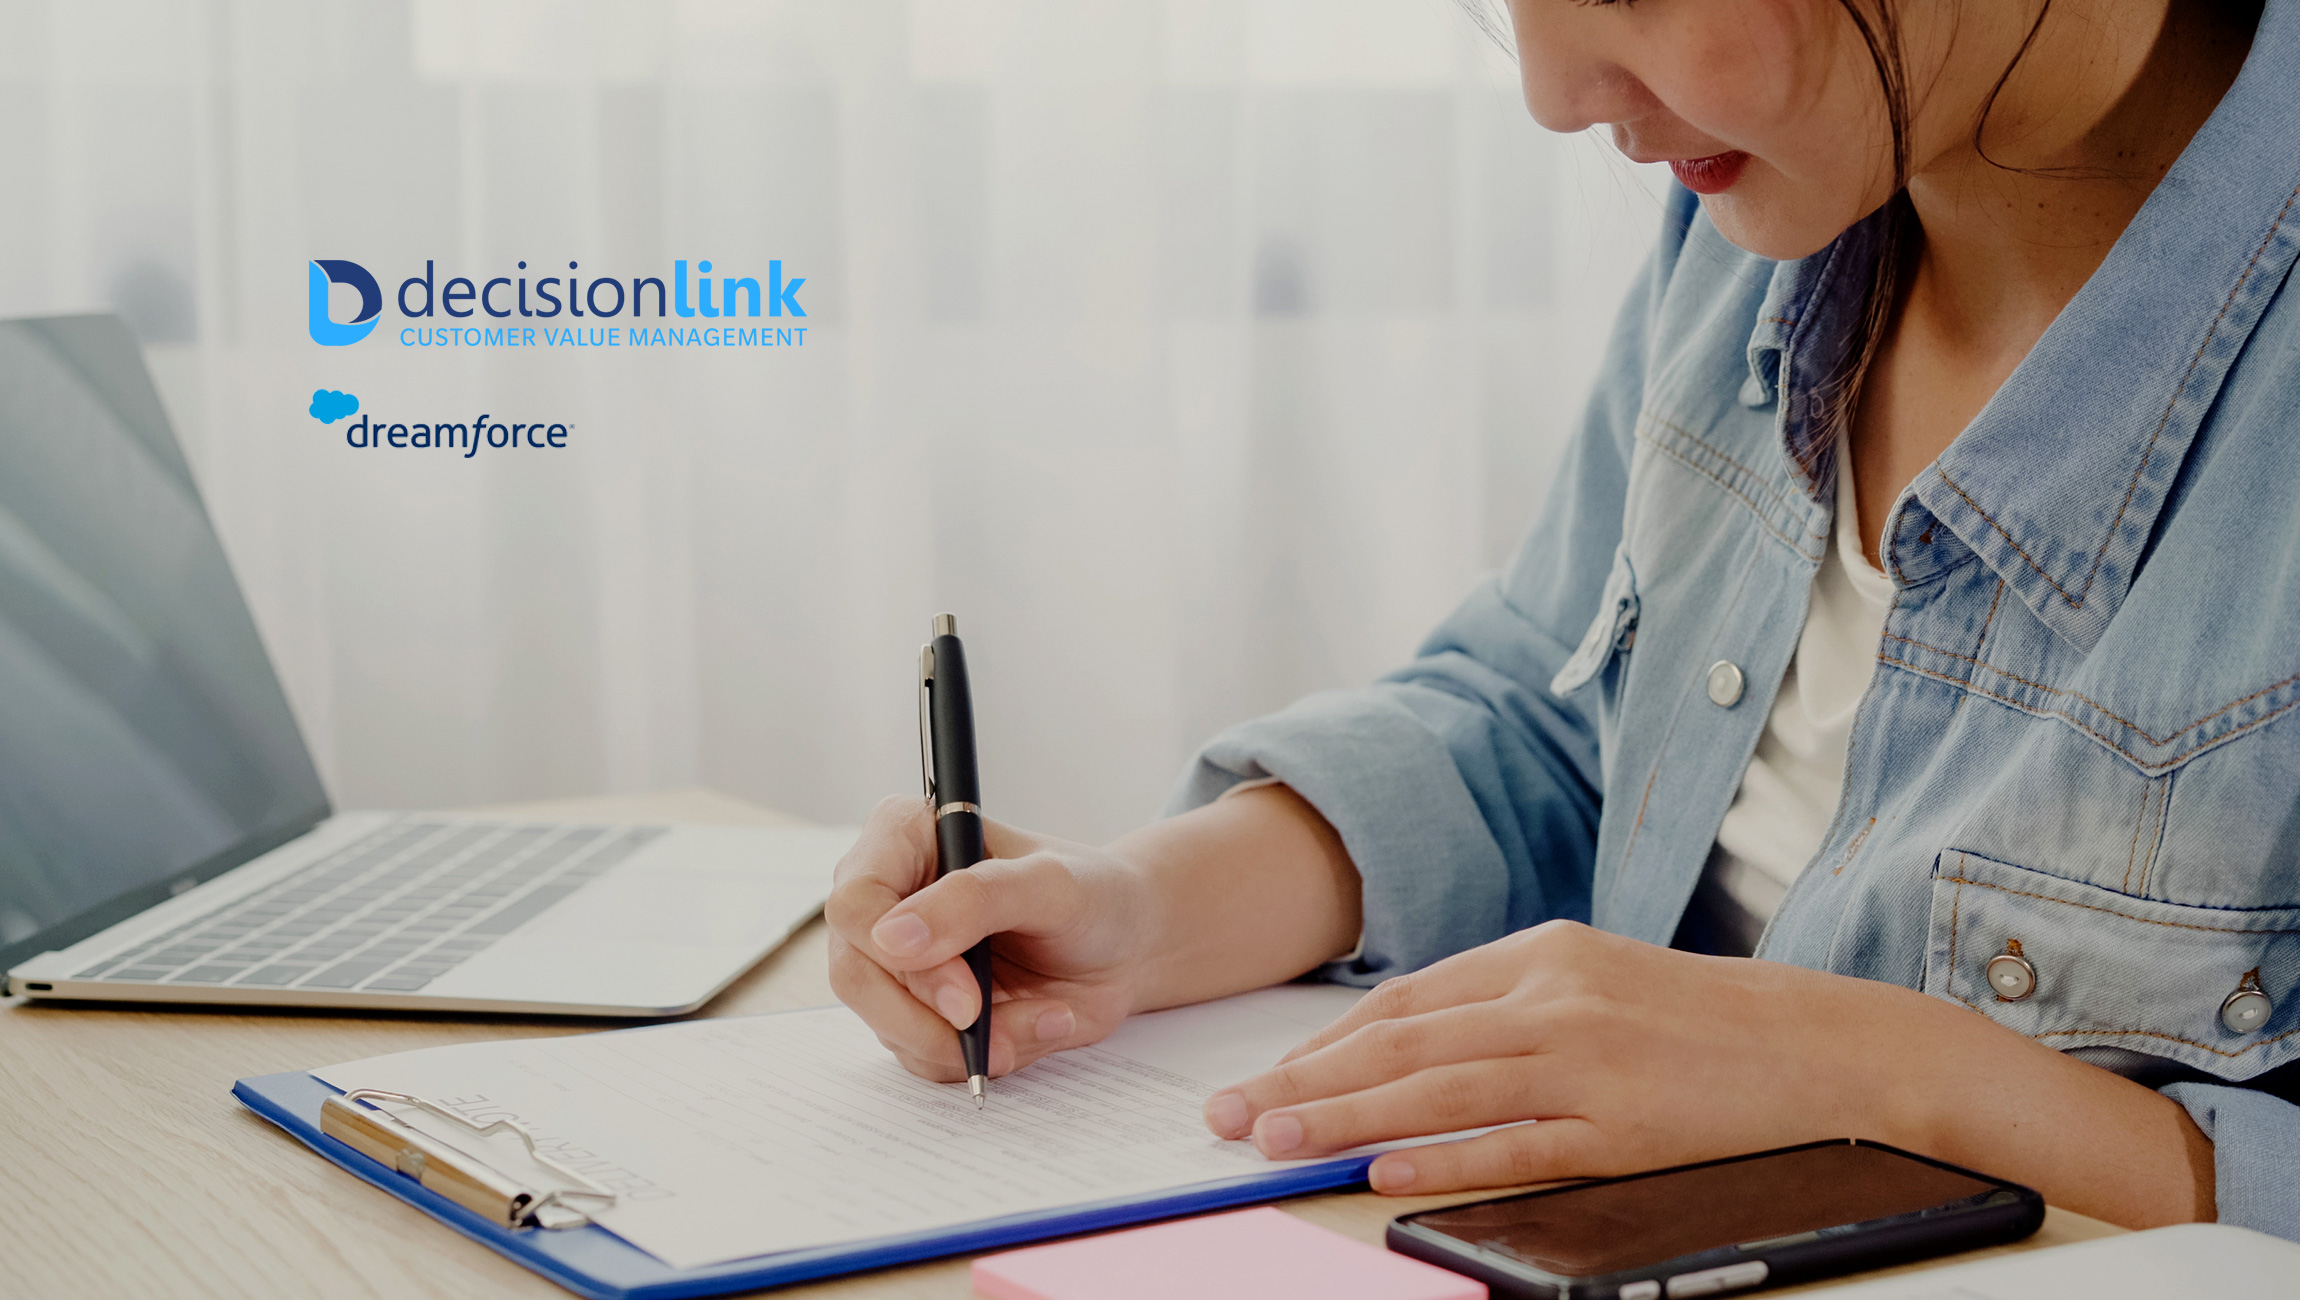 DecisionLink Secures $18.5M Series A to Meet Growing Demand for ValueCloud® Value Management Platform